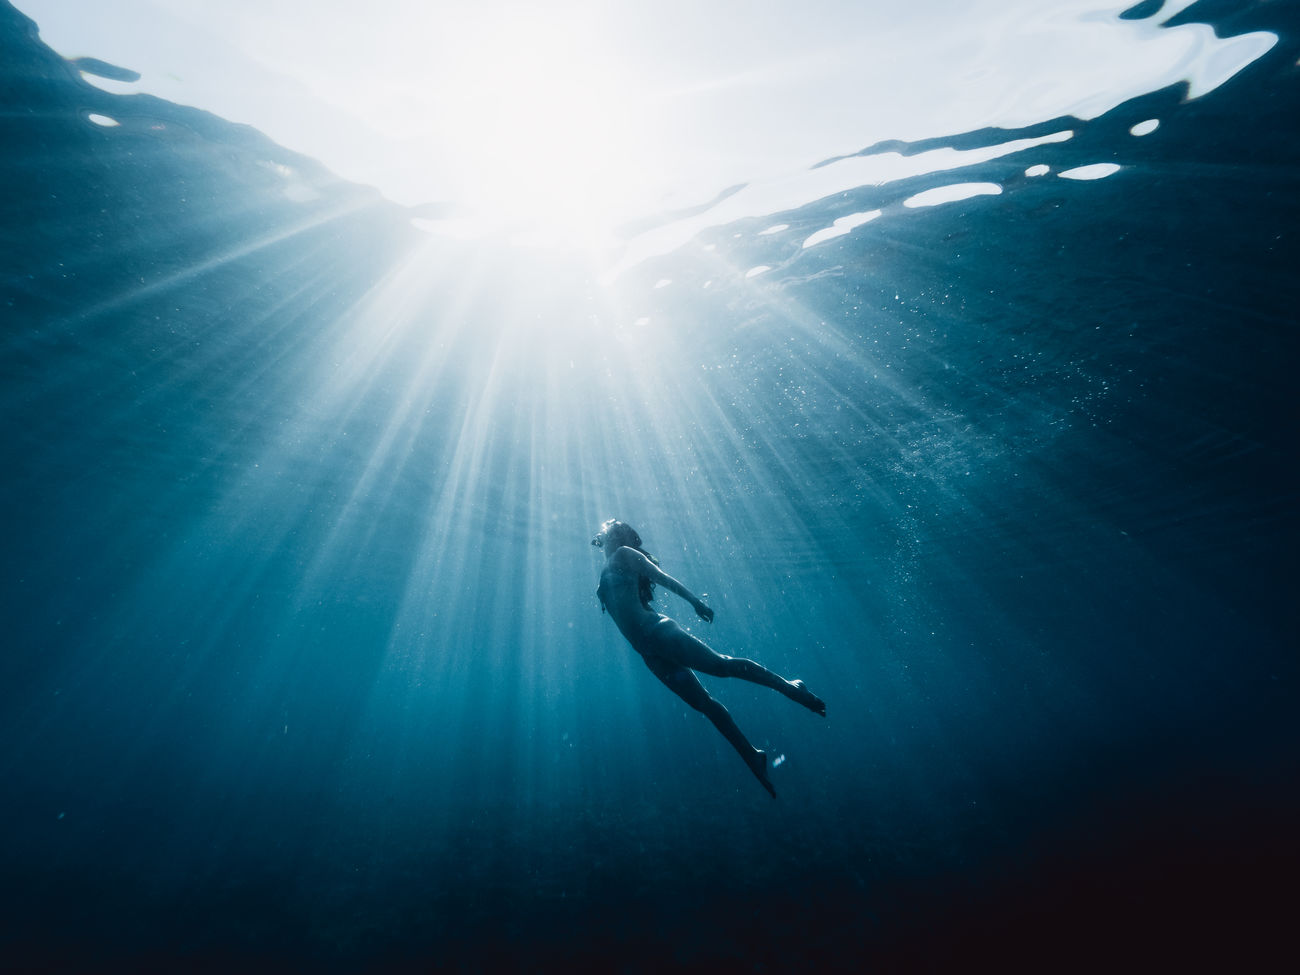 SILHOUETTE MAN SWIMMING IN SEA